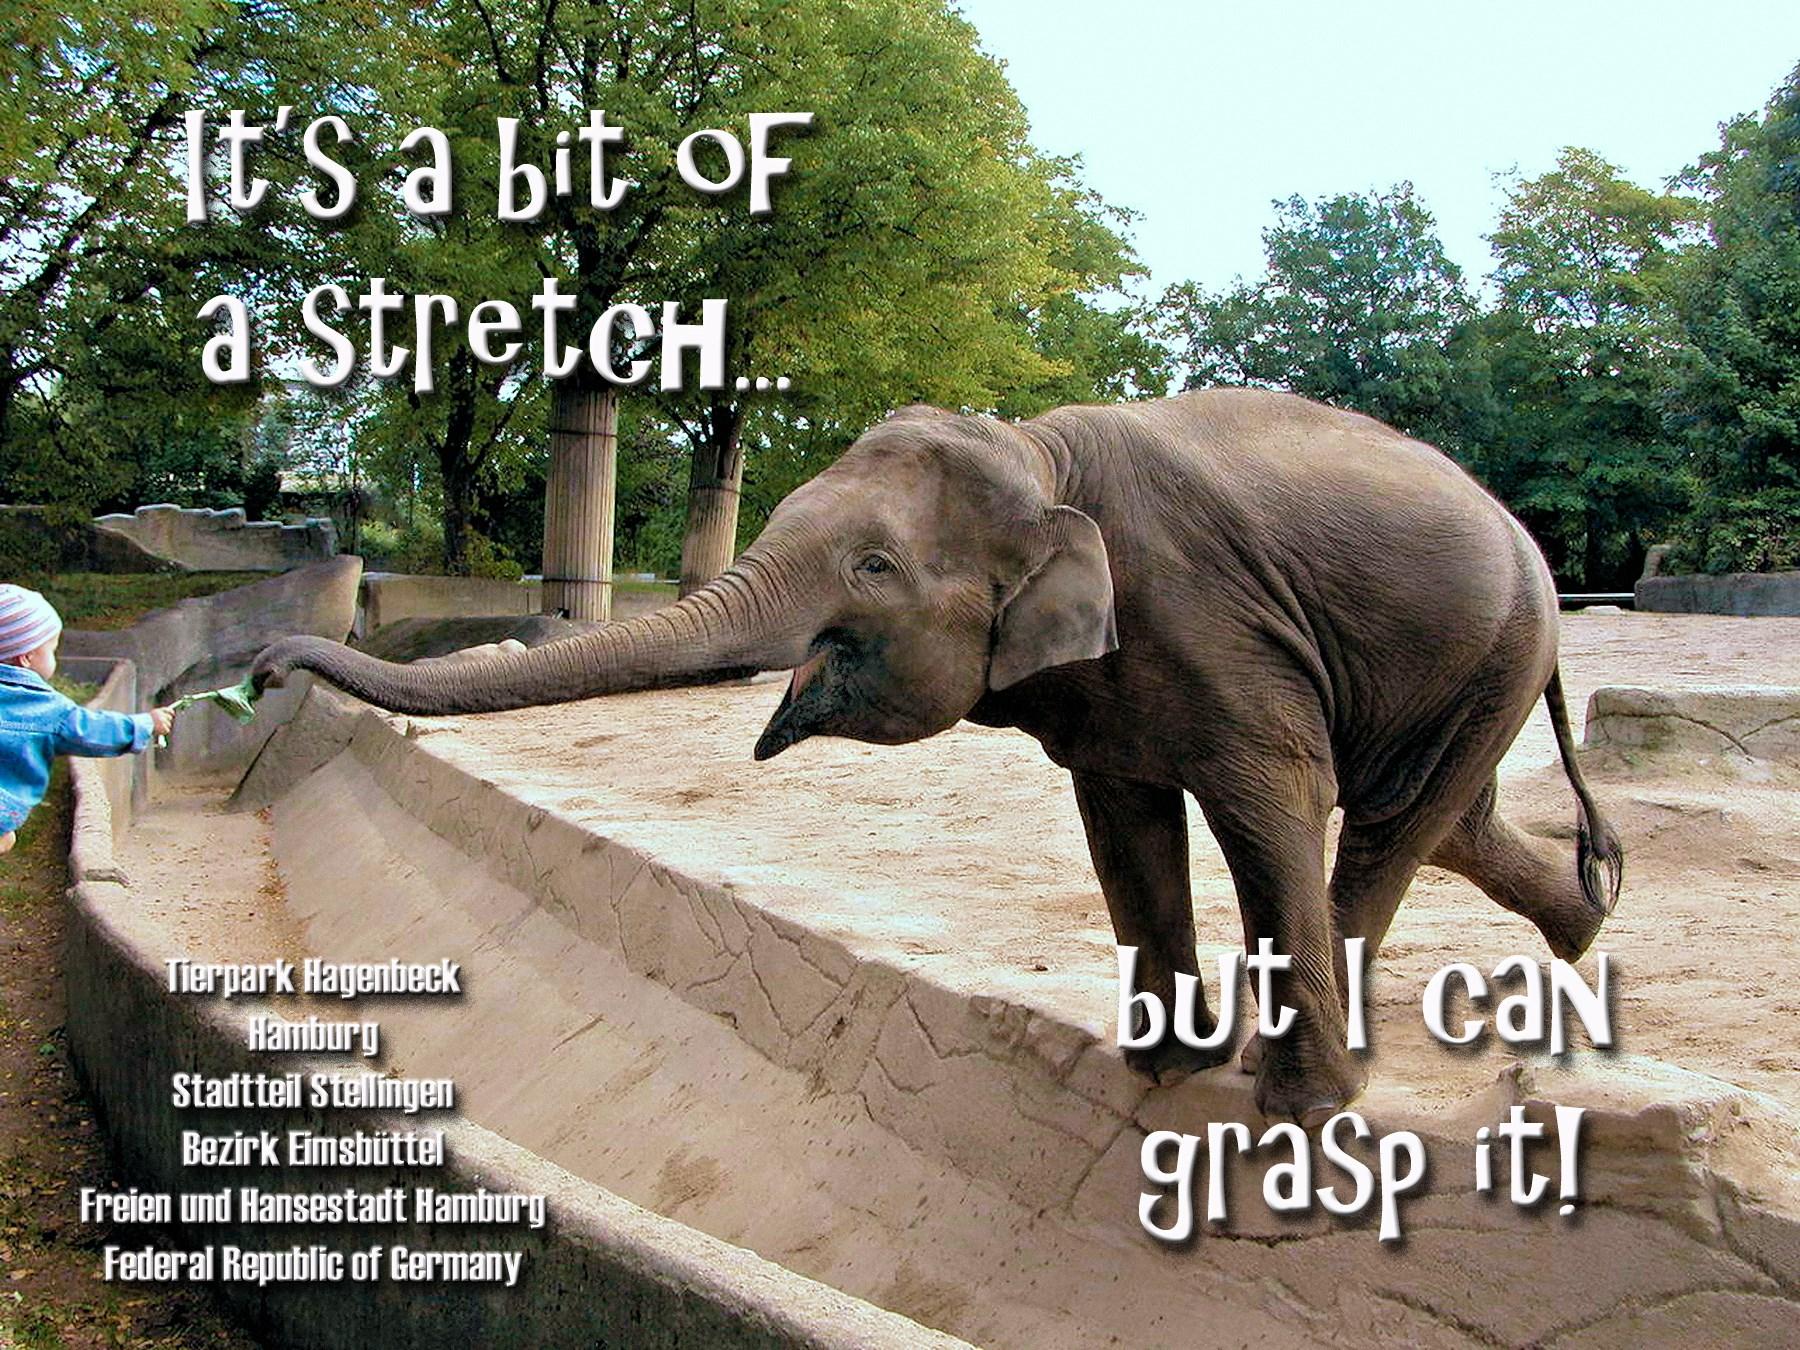 00 elephant 060816